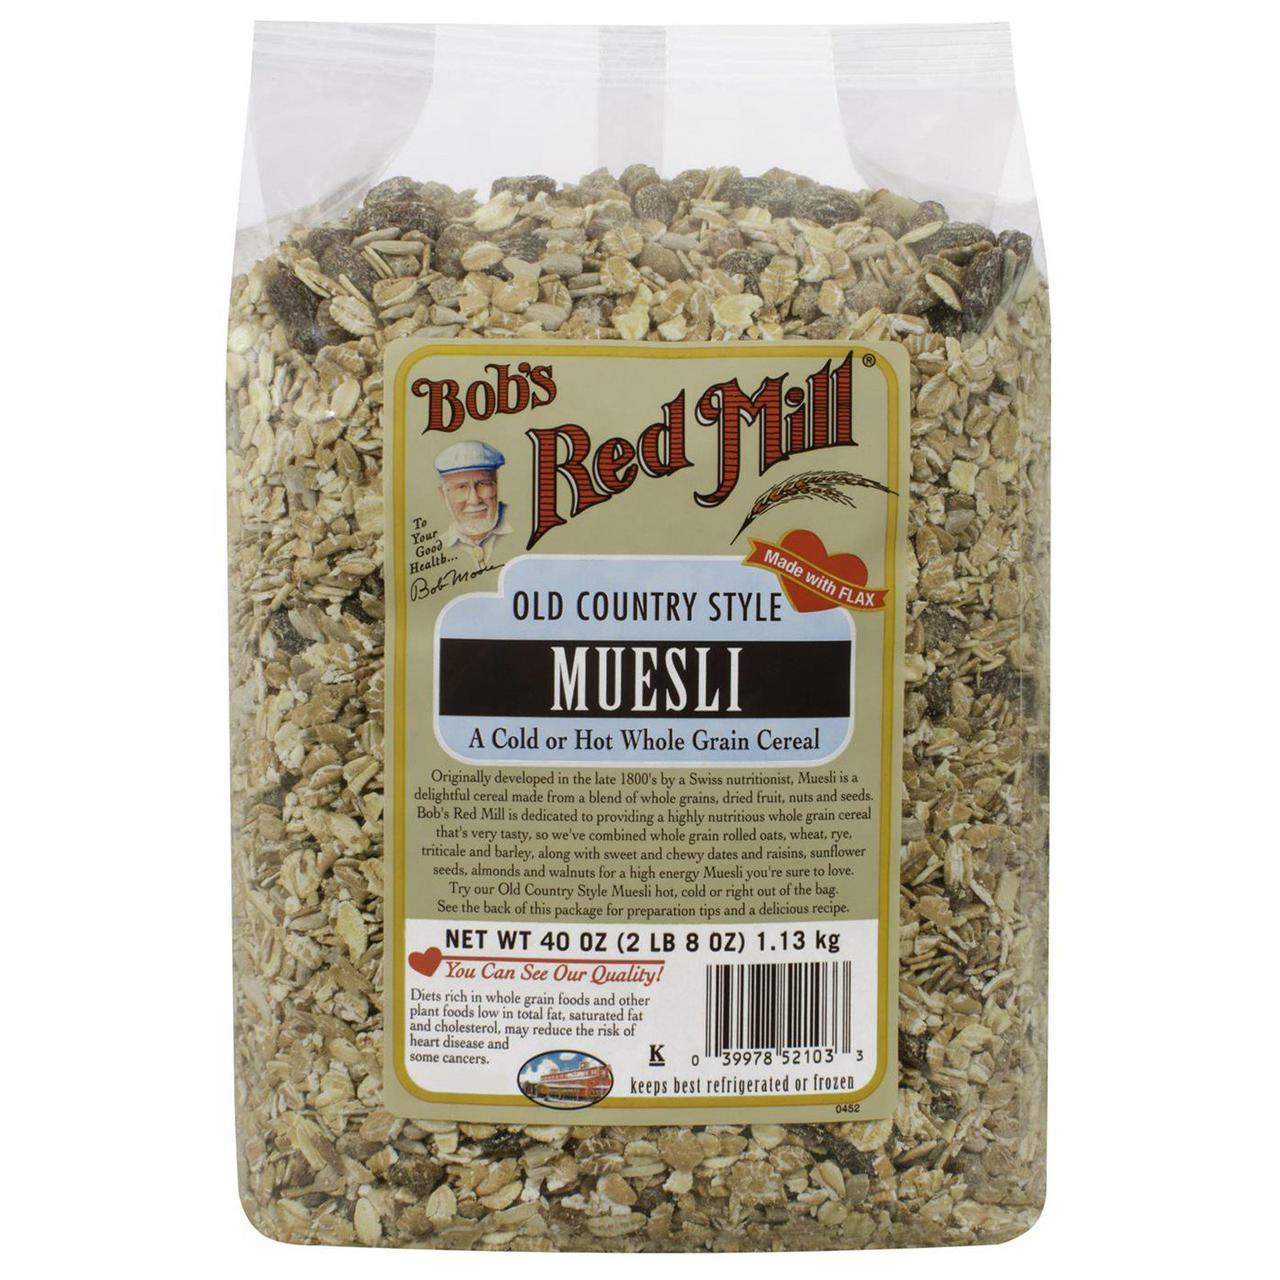 Bobs Red Mill, Мюсли в стародеревенском стиле, 40 унций (1.13 кг)